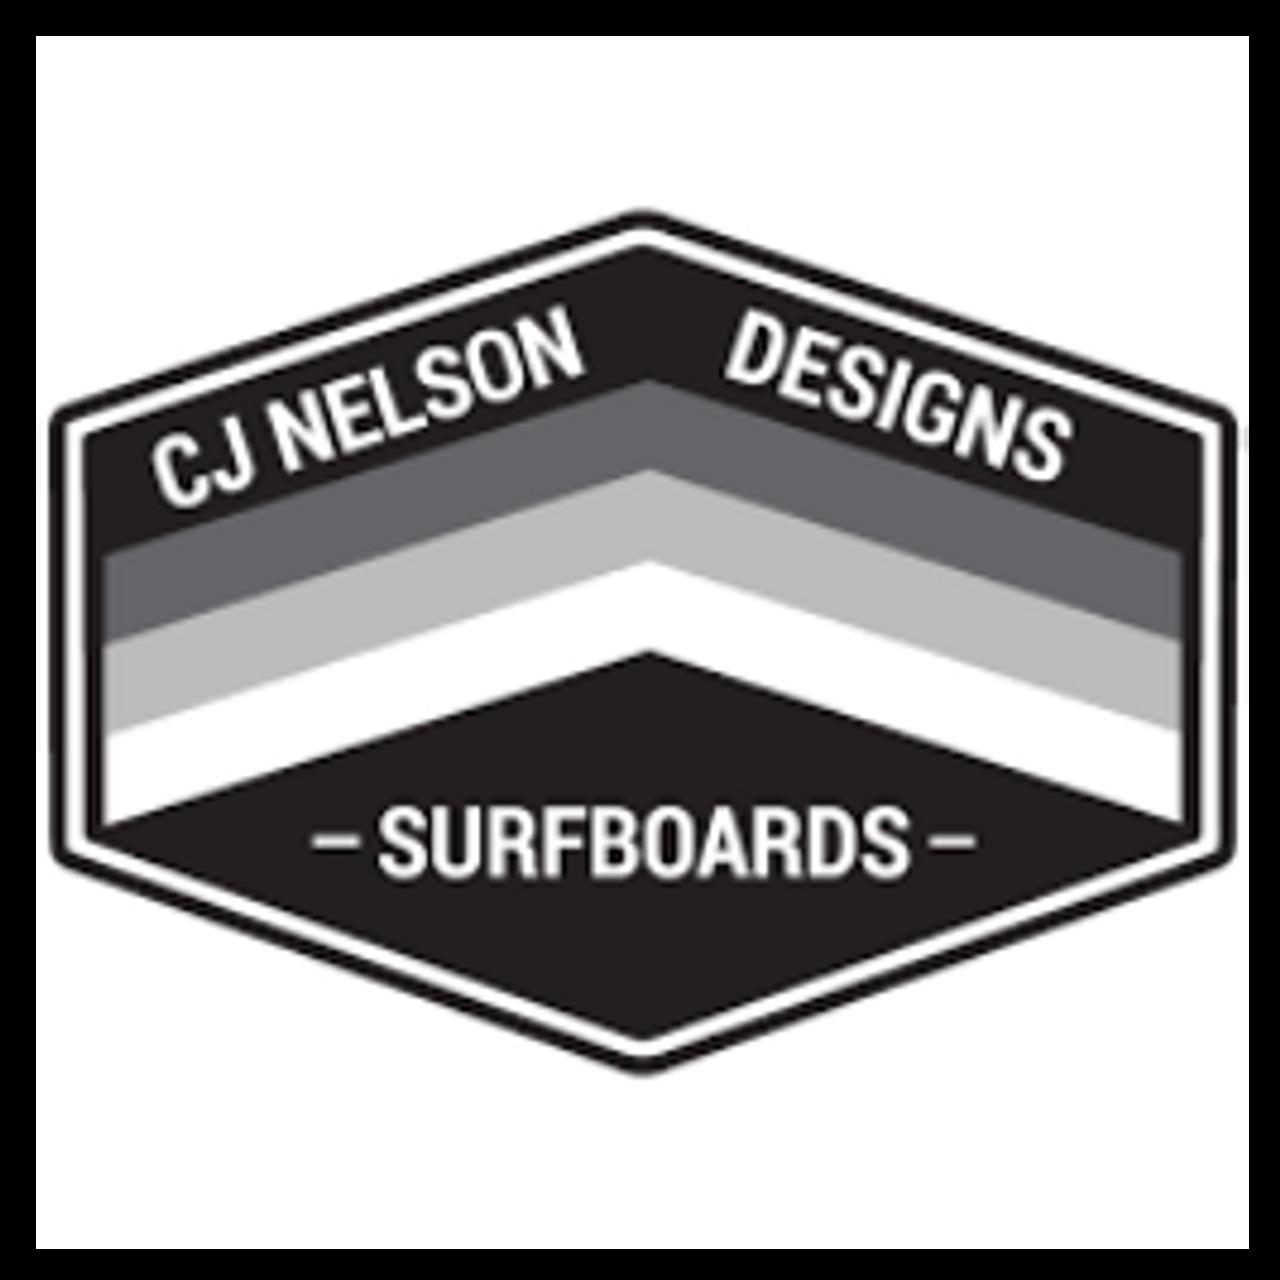 CJ Nelson Designs